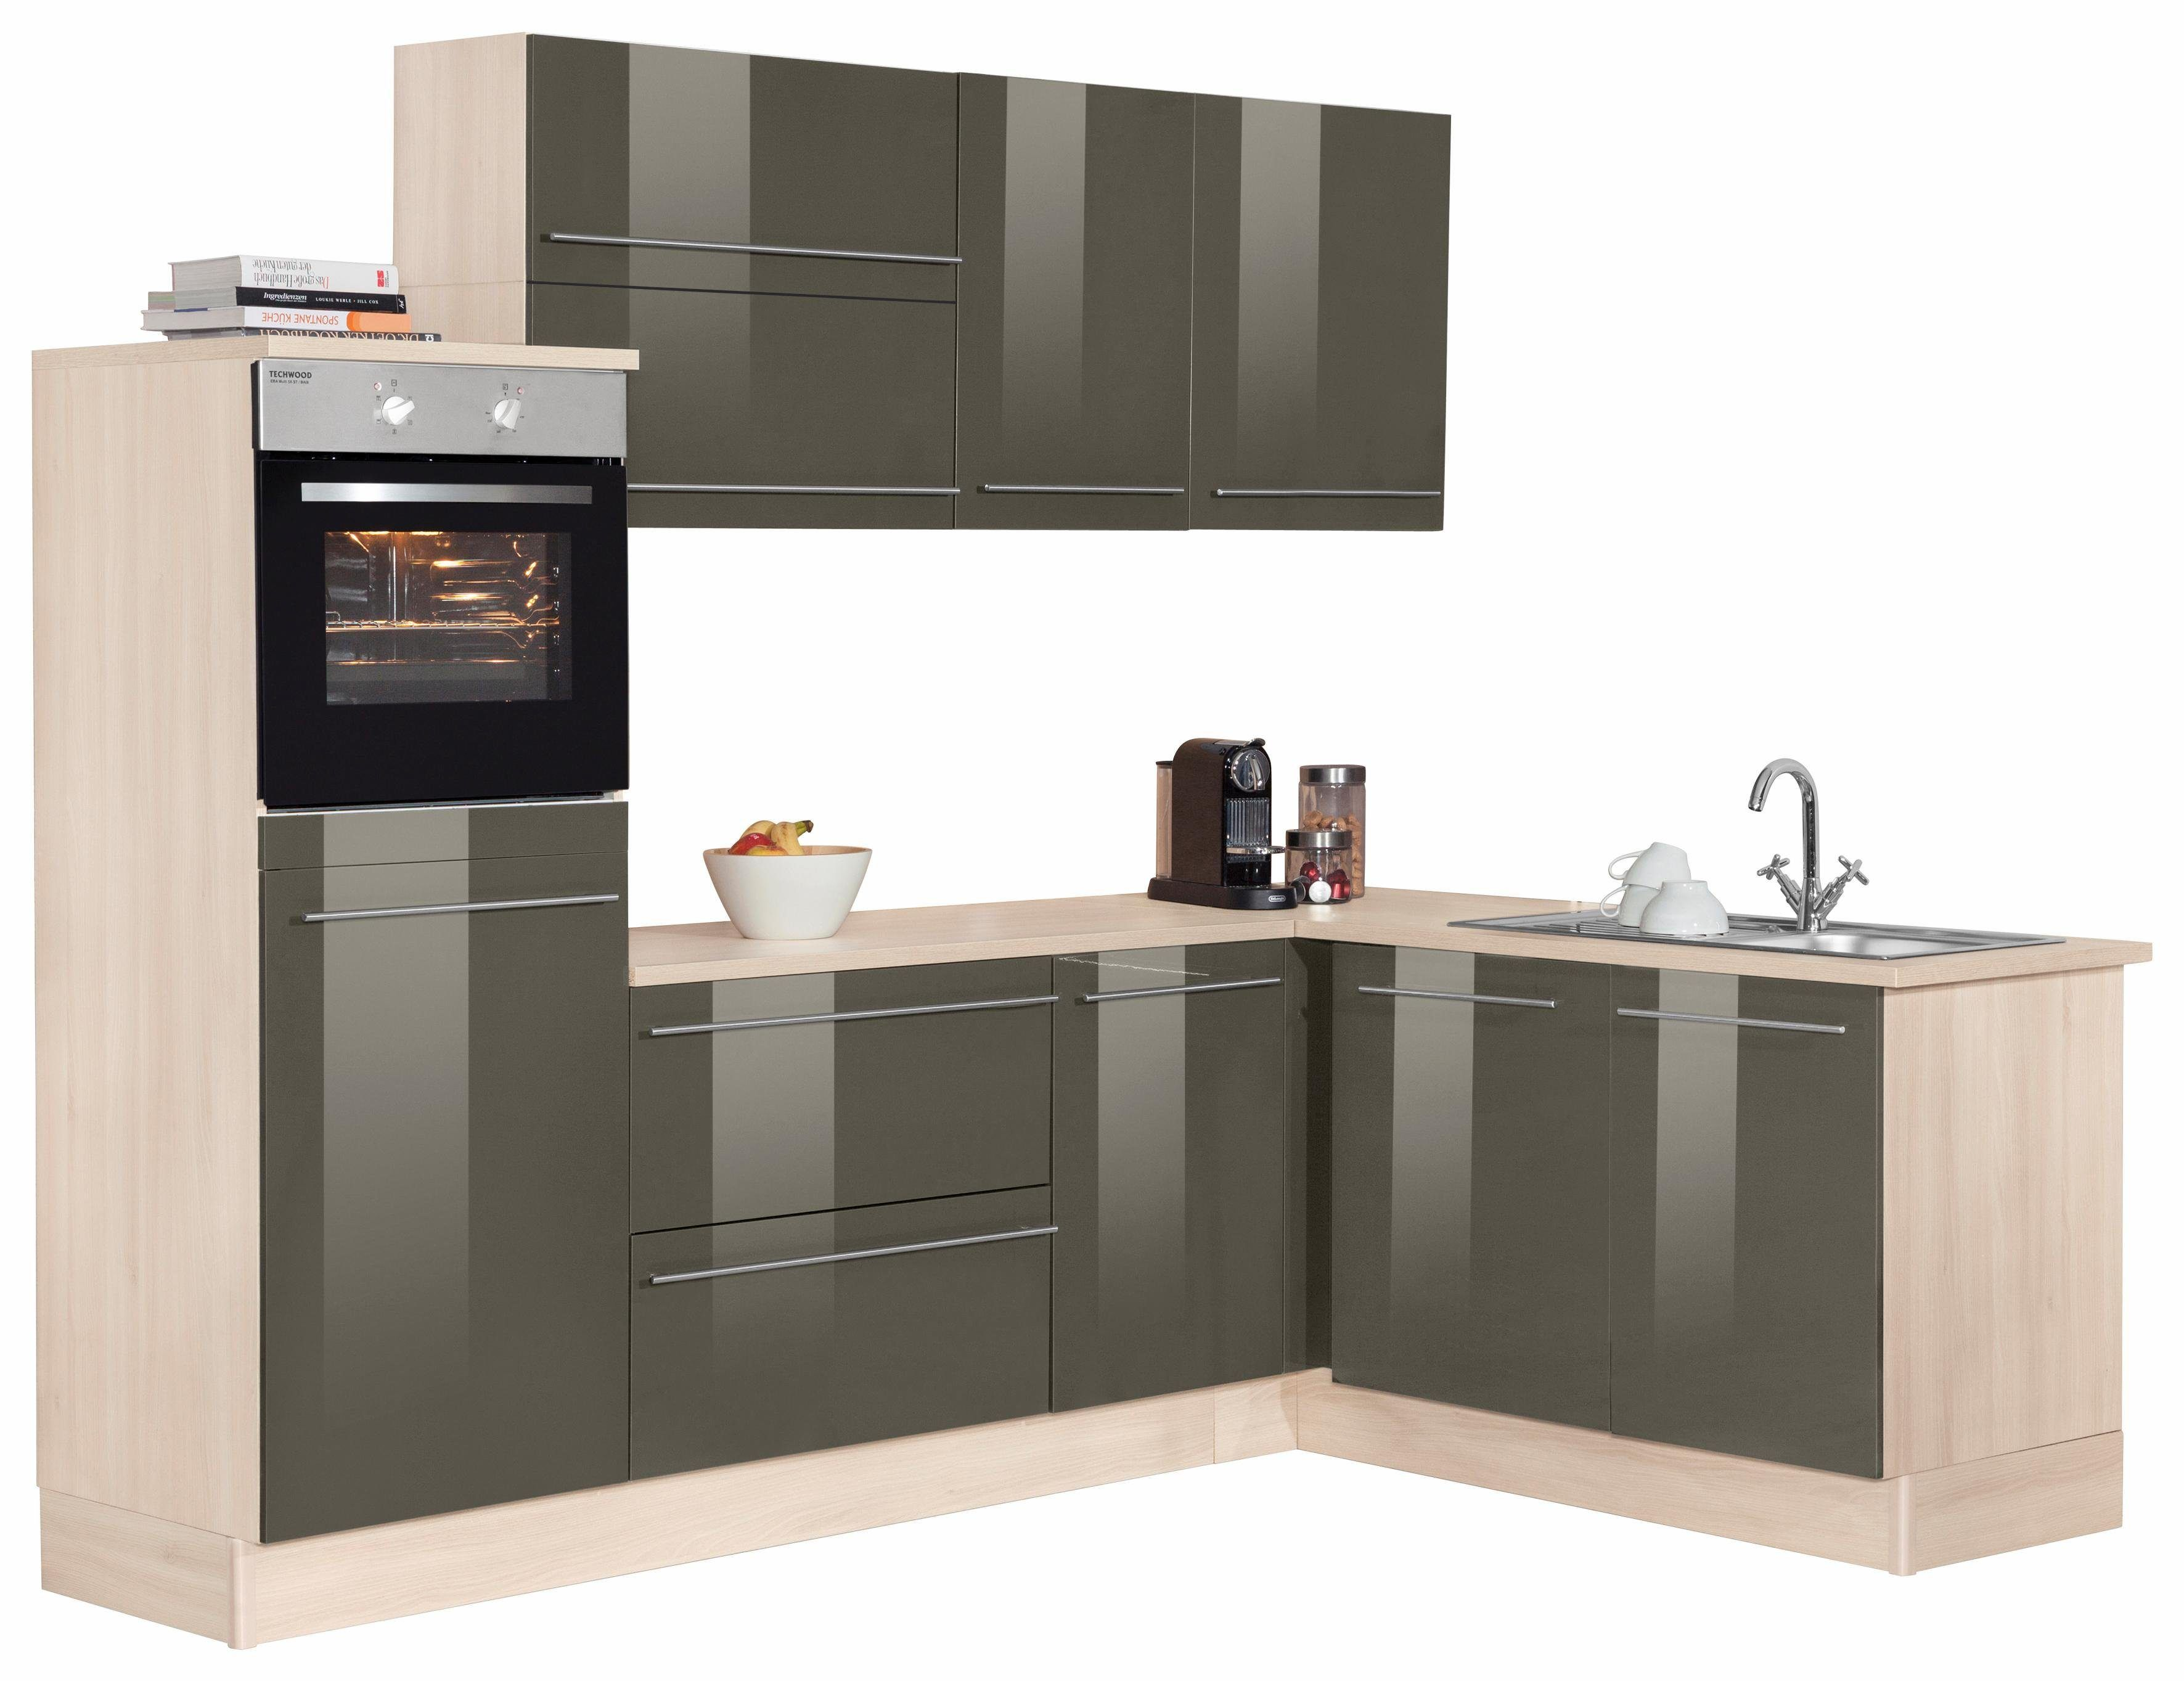 kuche mit aufbauservice. Black Bedroom Furniture Sets. Home Design Ideas